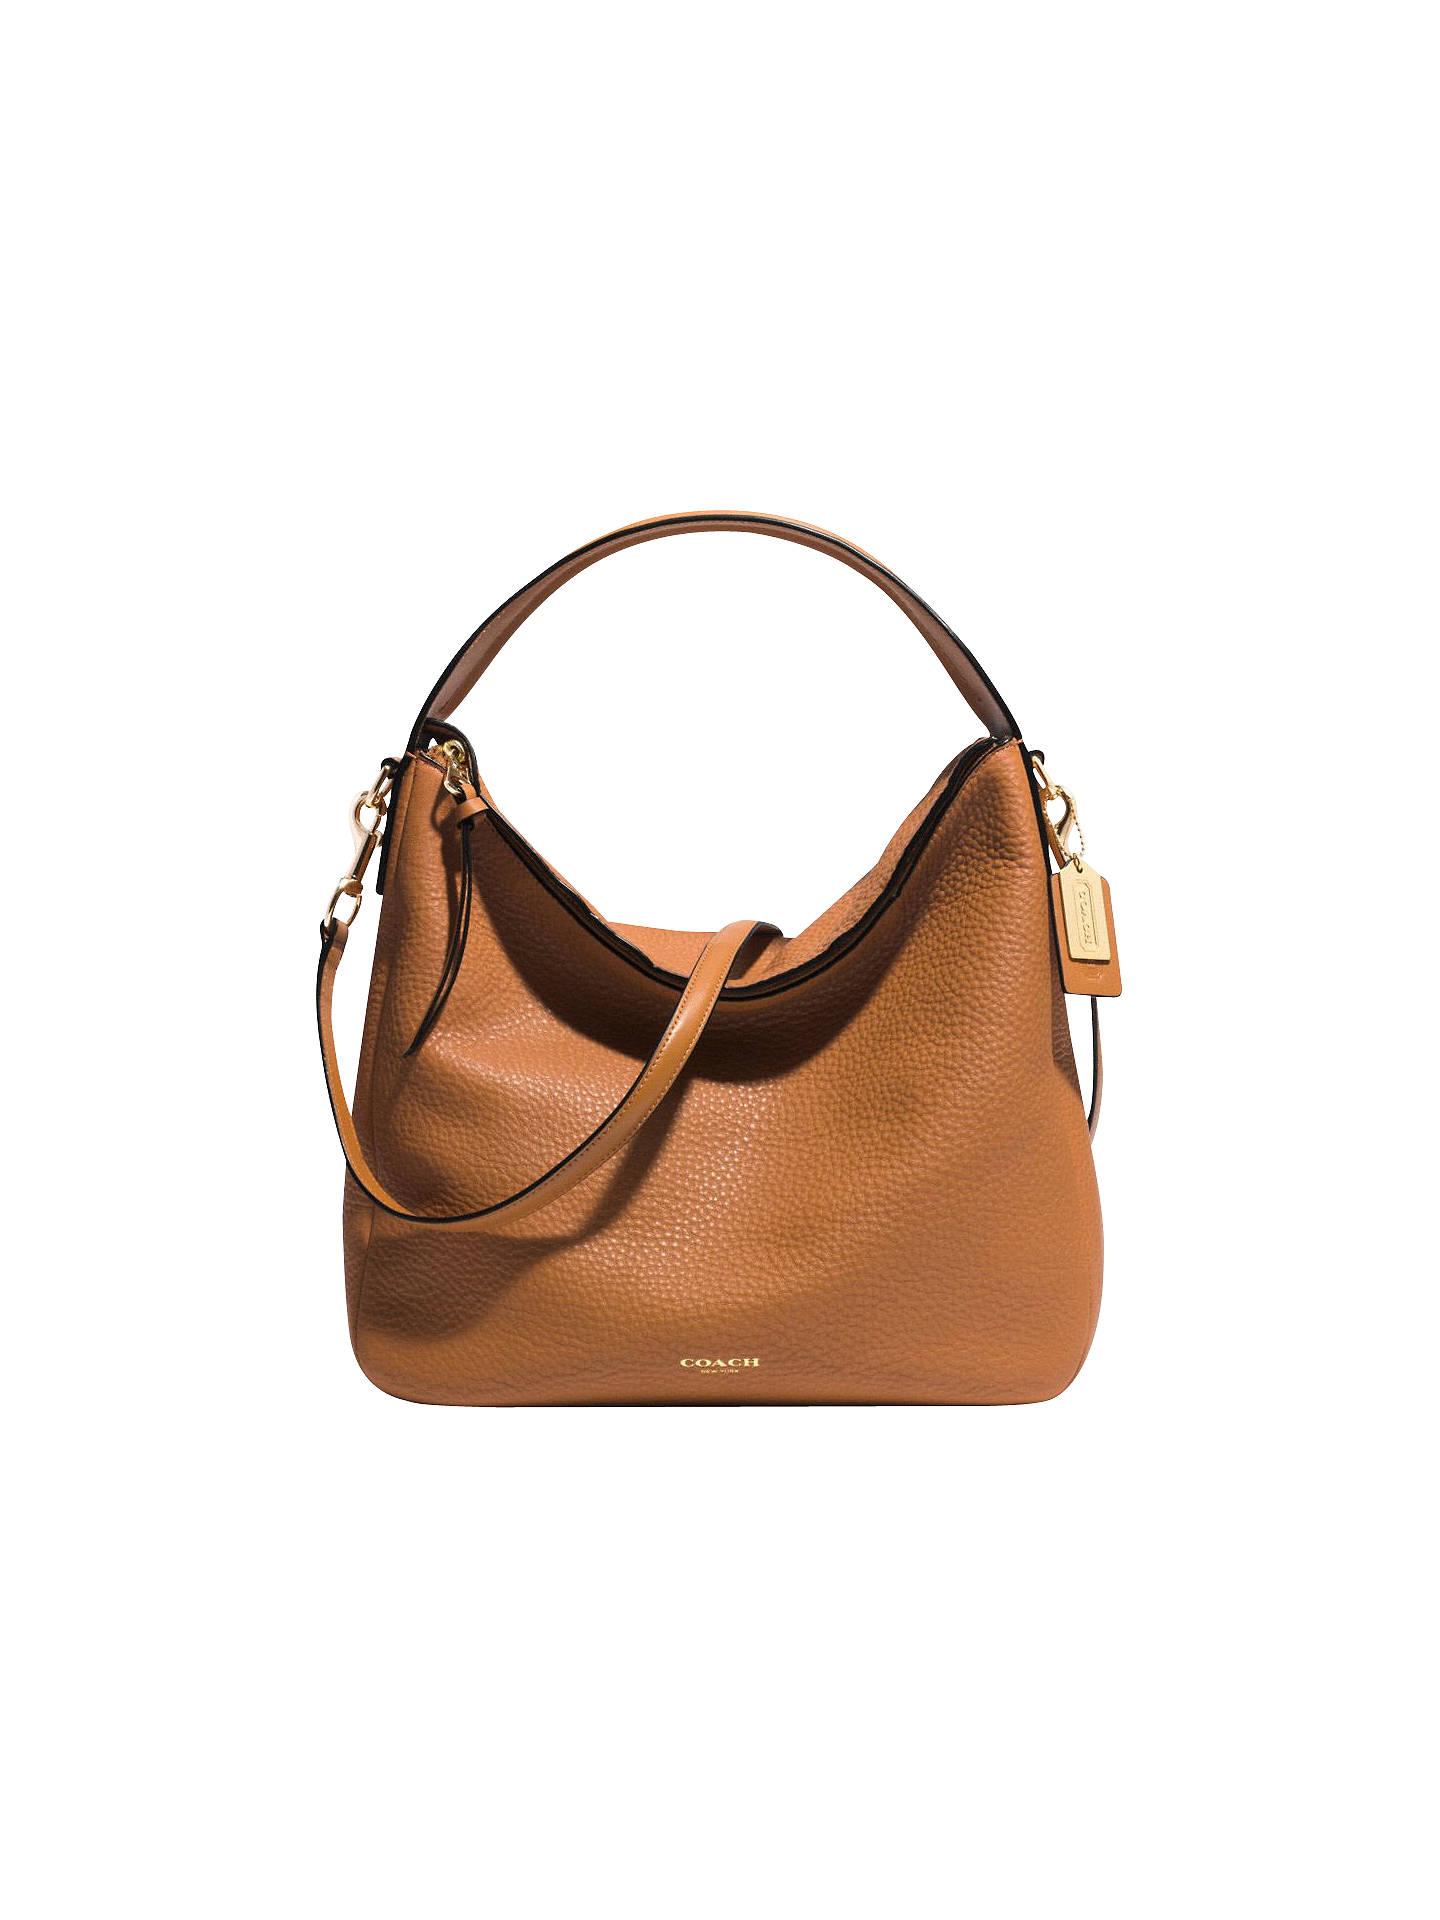 1c22693805 Buy Coach Bleecker Sullivan Pebbled Leather Hobo Bag